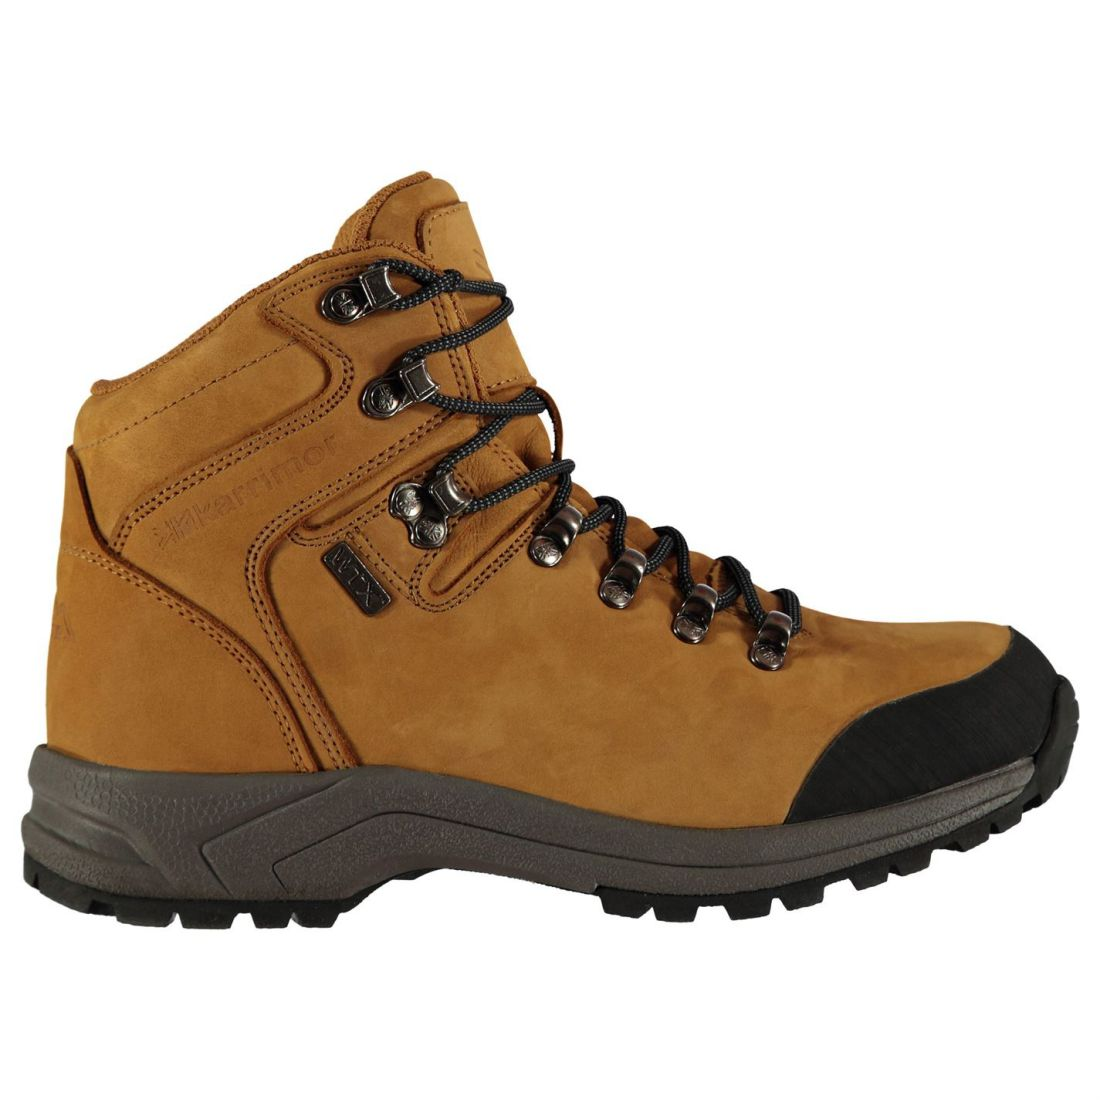 Karrimor Blencathra Walking Boots Ladies Shoes Ventilated -5934